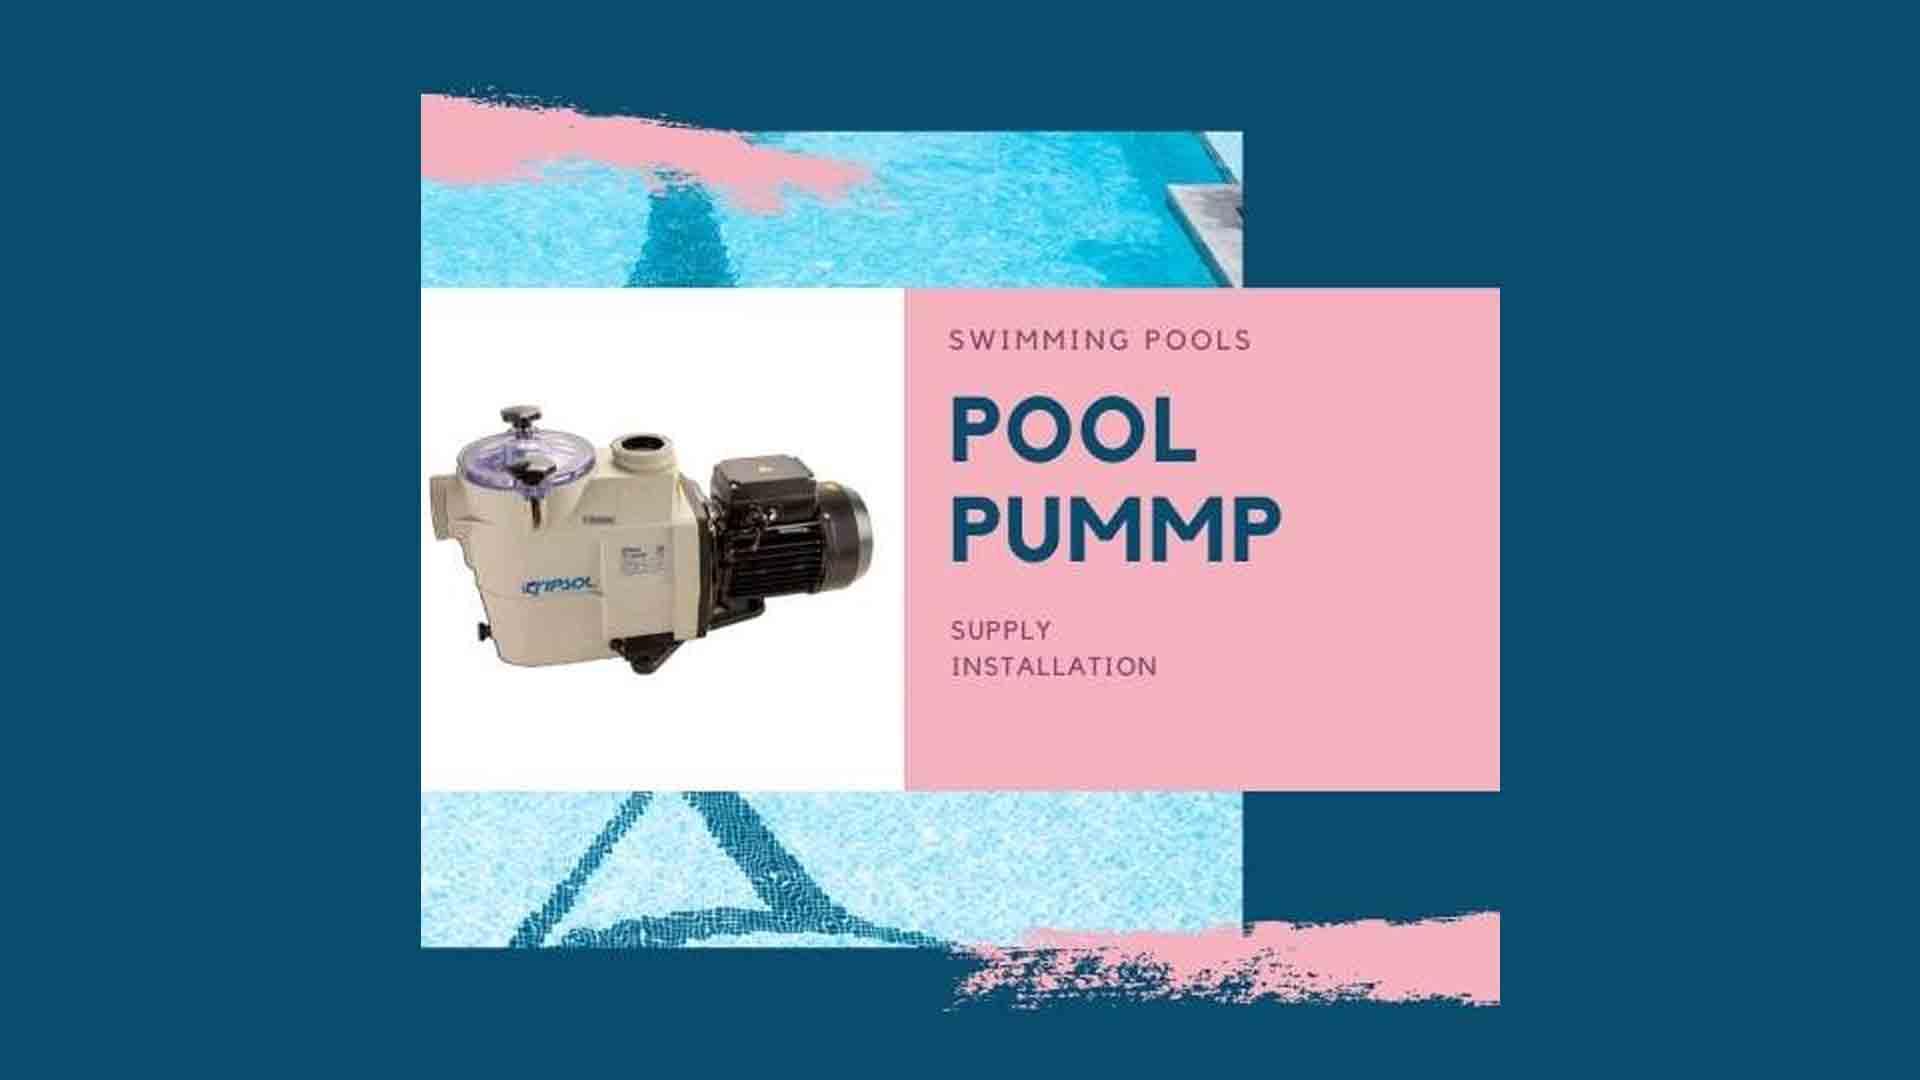 swimming pool pumps